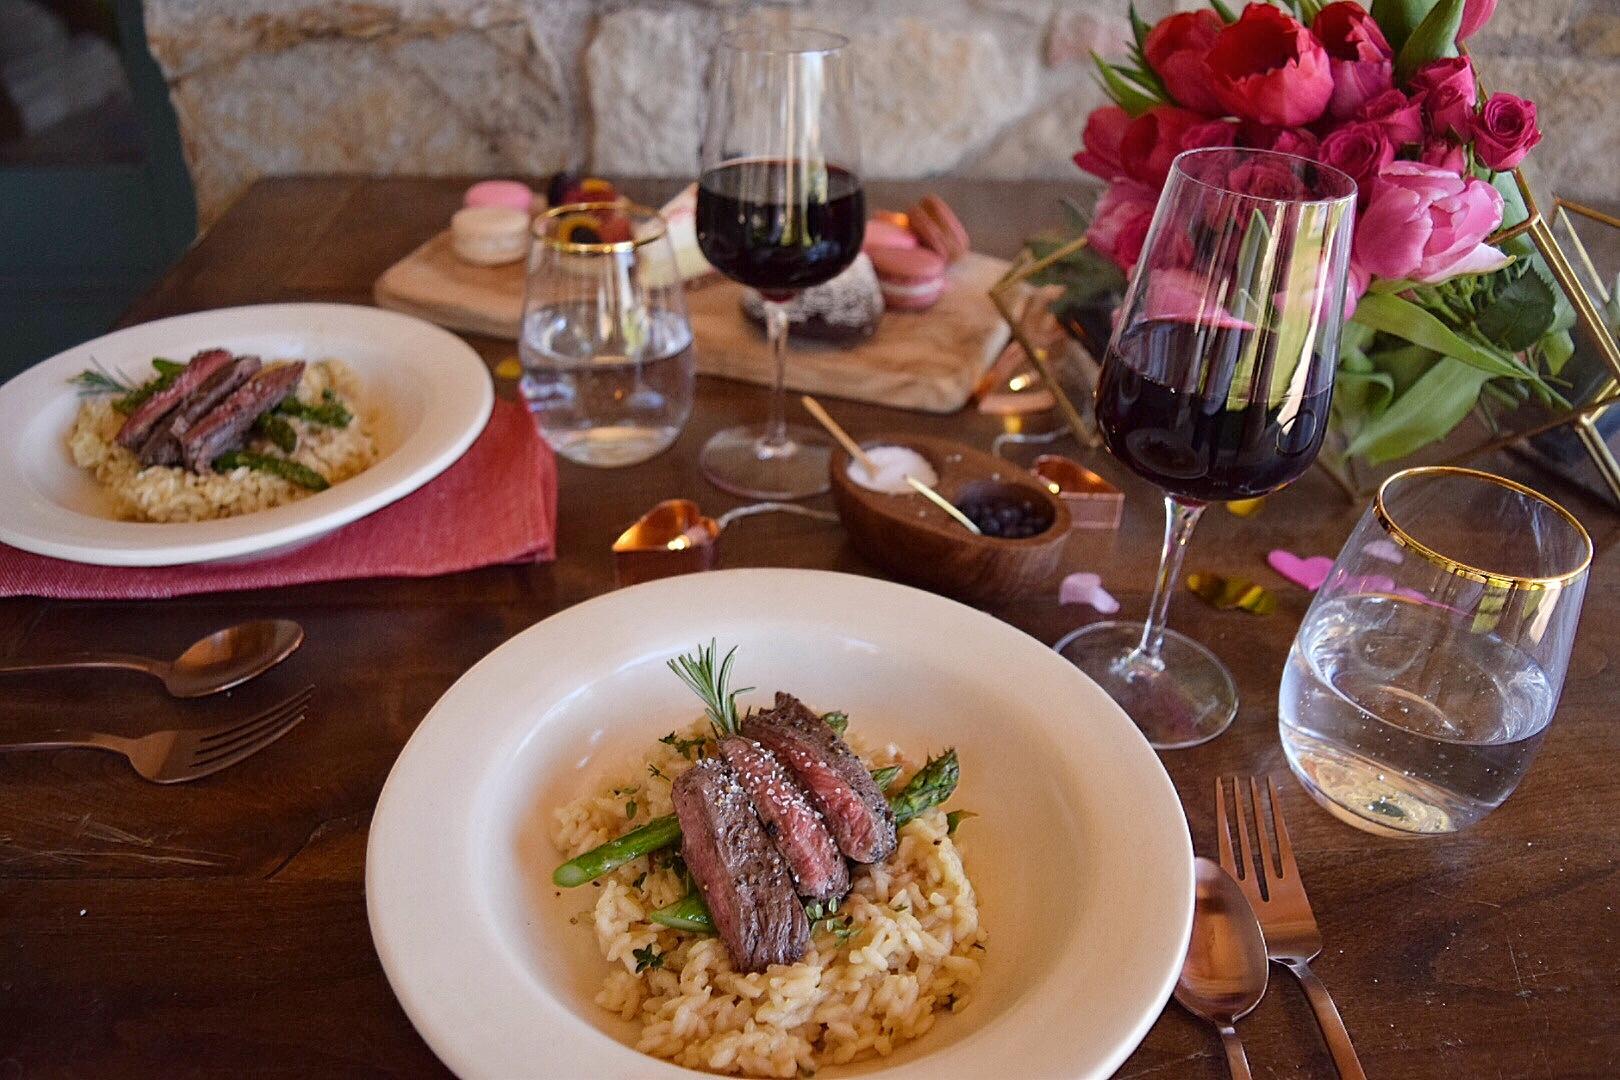 Valentine's Day DInner Menu: Skirt Steak & Gorgonzola Risotto